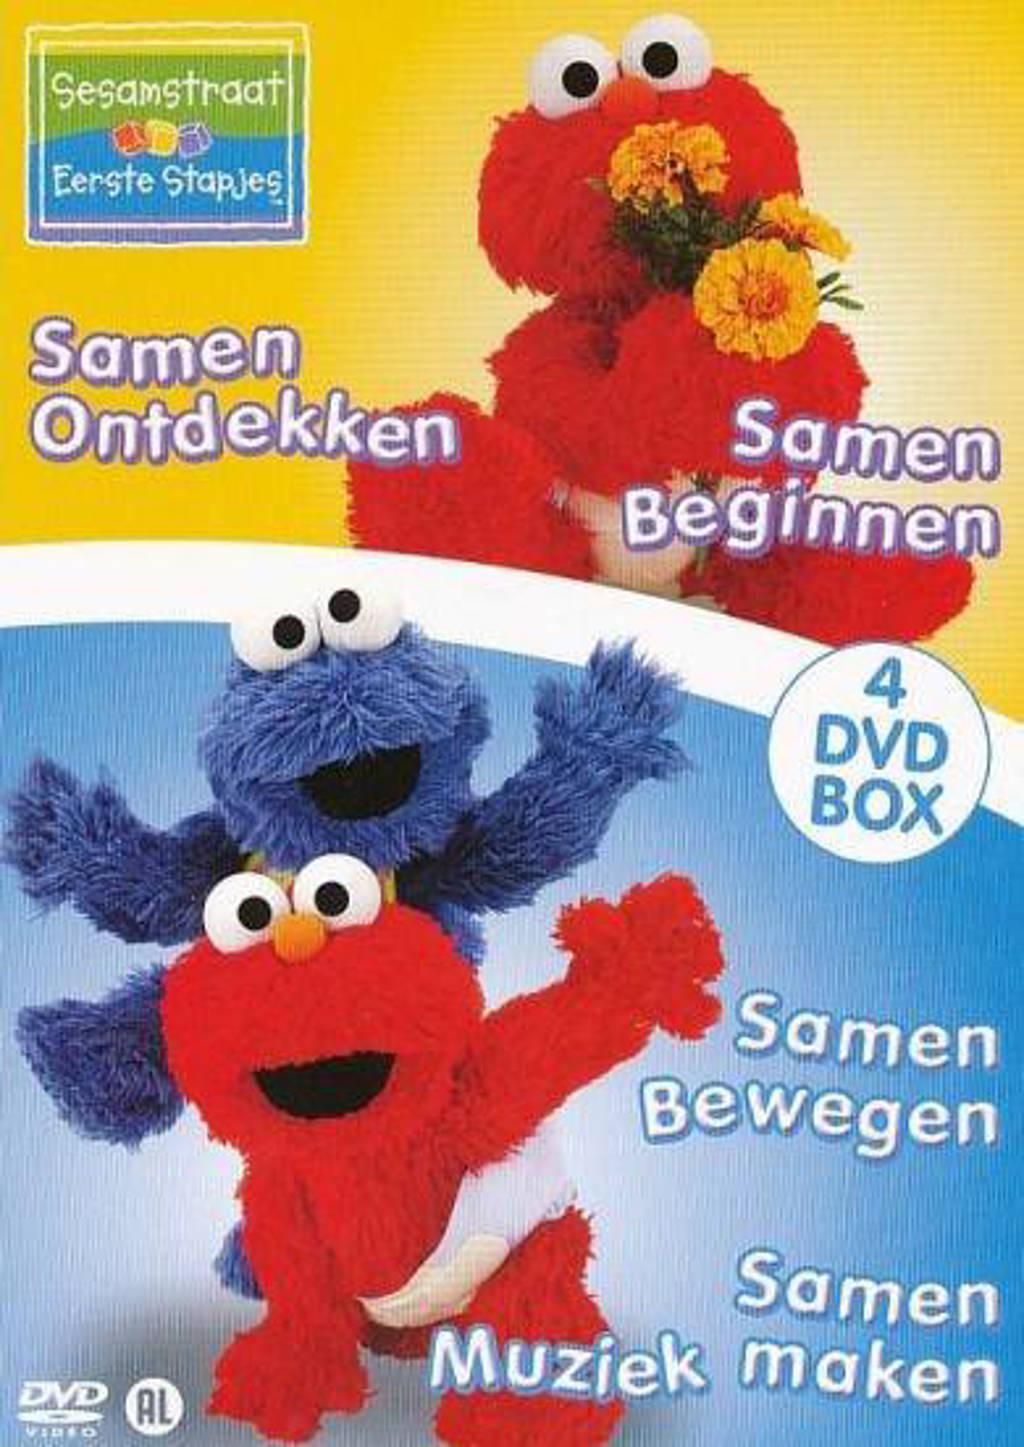 Sesamstraat box (DVD)